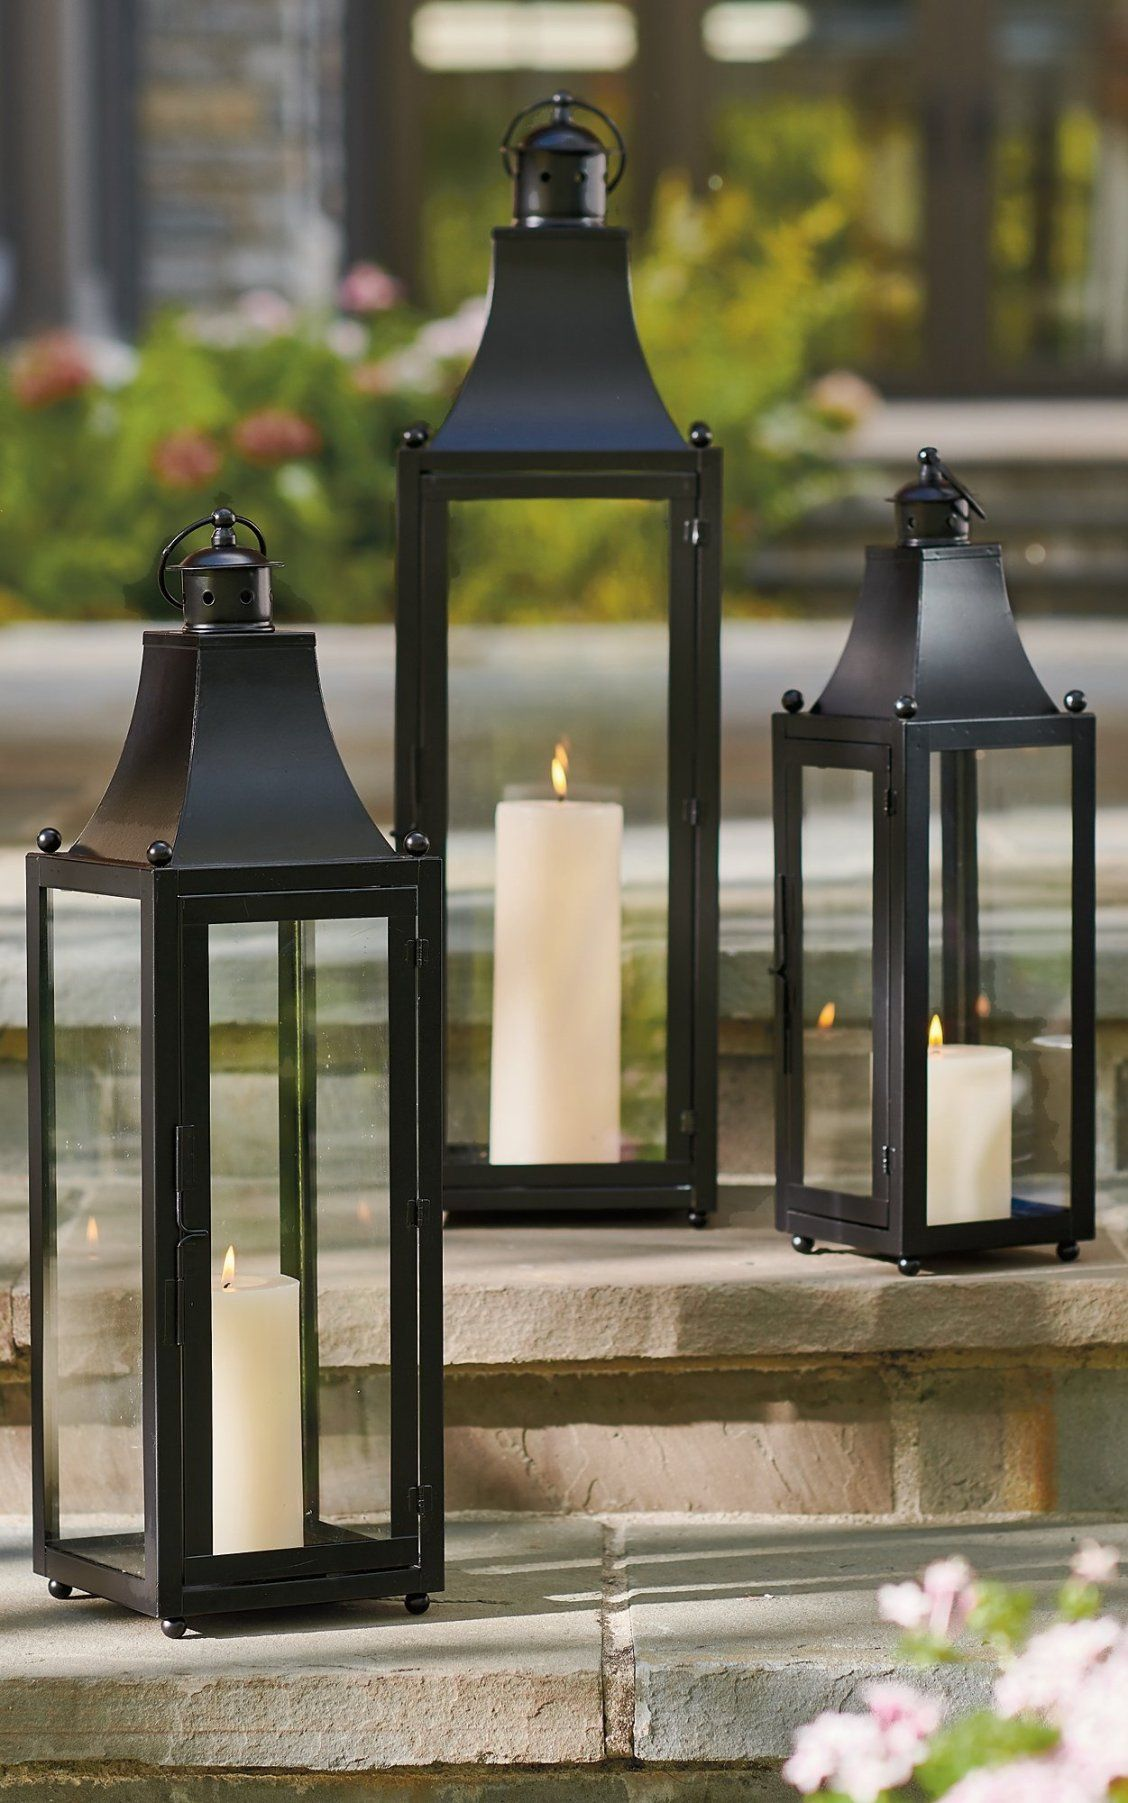 Baxter Outdoor Lantern Grandin Road Outdoor Lanterns Lanterns Outdoor Candles